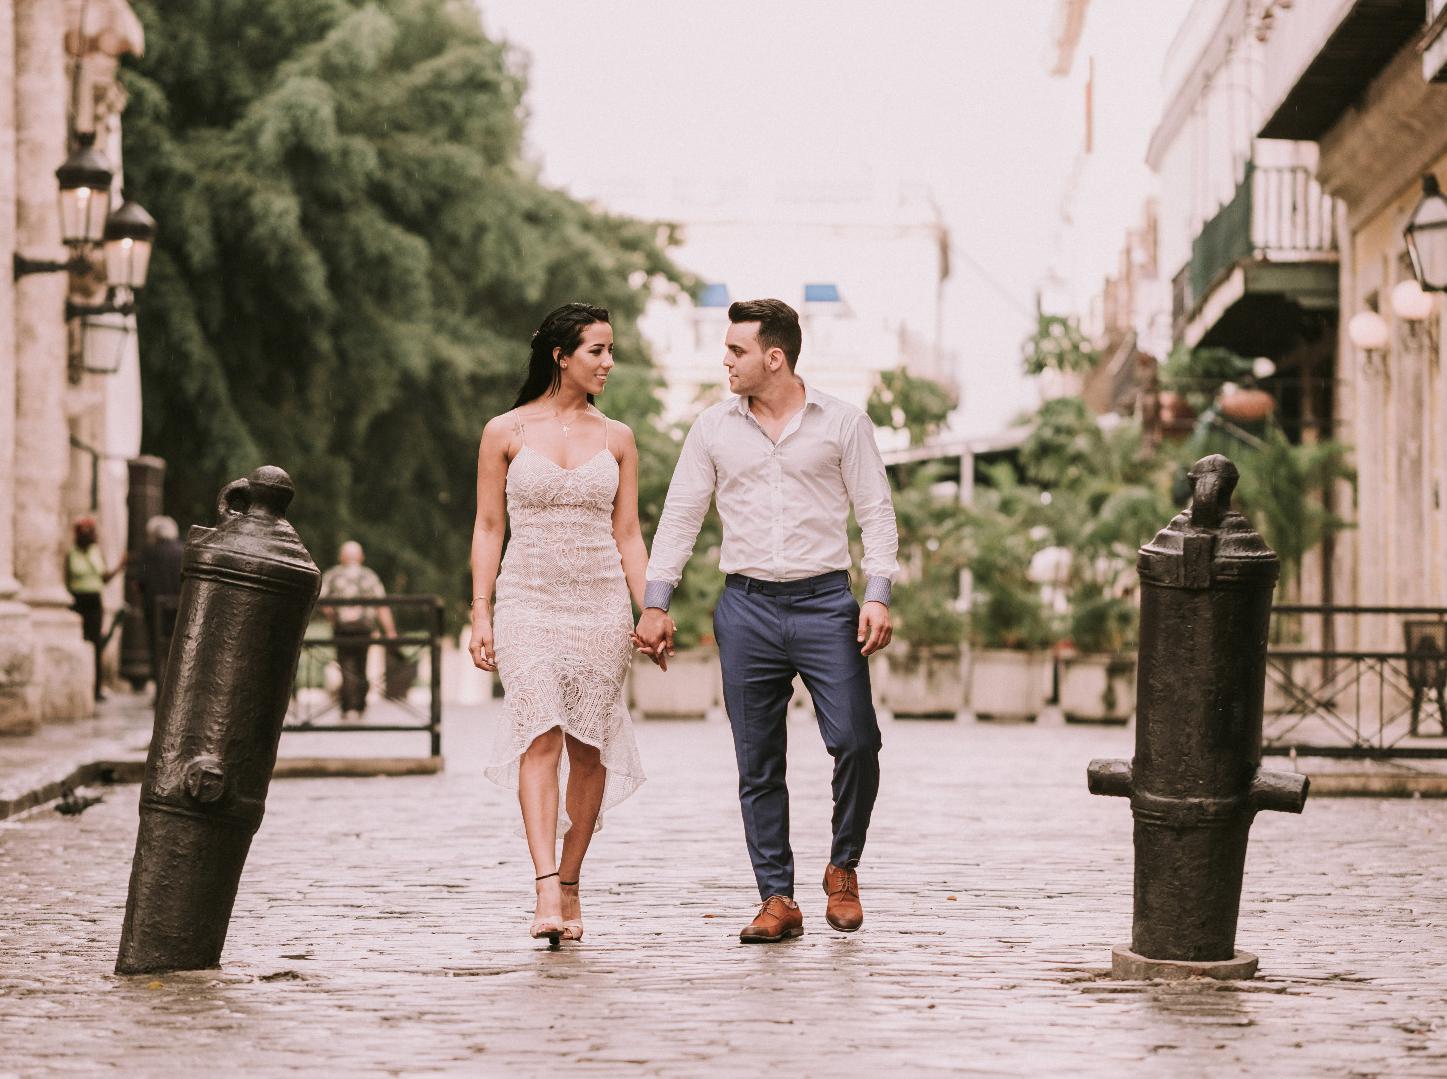 bodas-sin-clasificar-sin-tema-cuba-35251.jpg